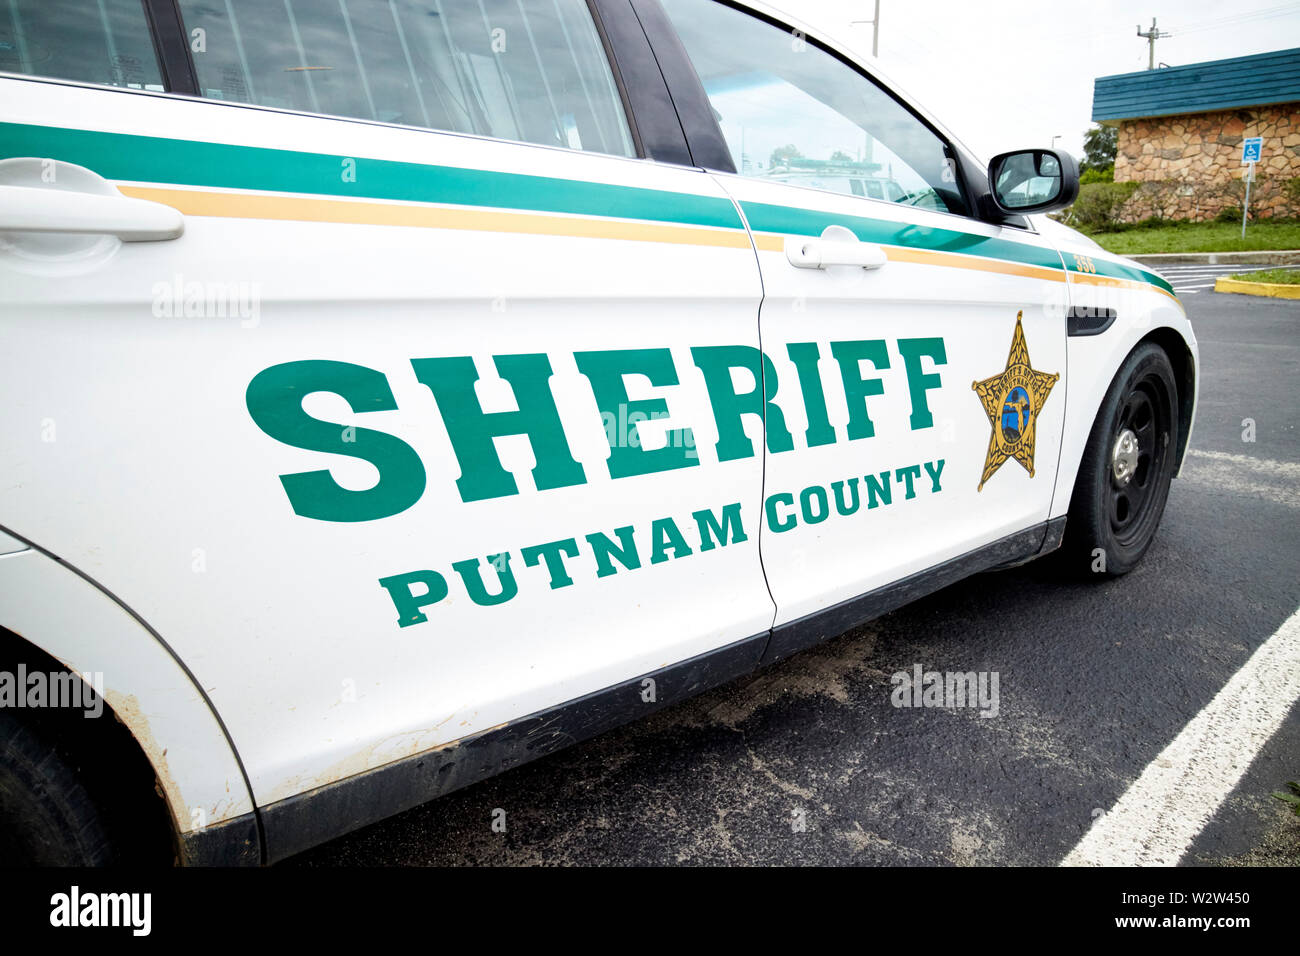 County Sheriff Florida Stock Photos & County Sheriff Florida